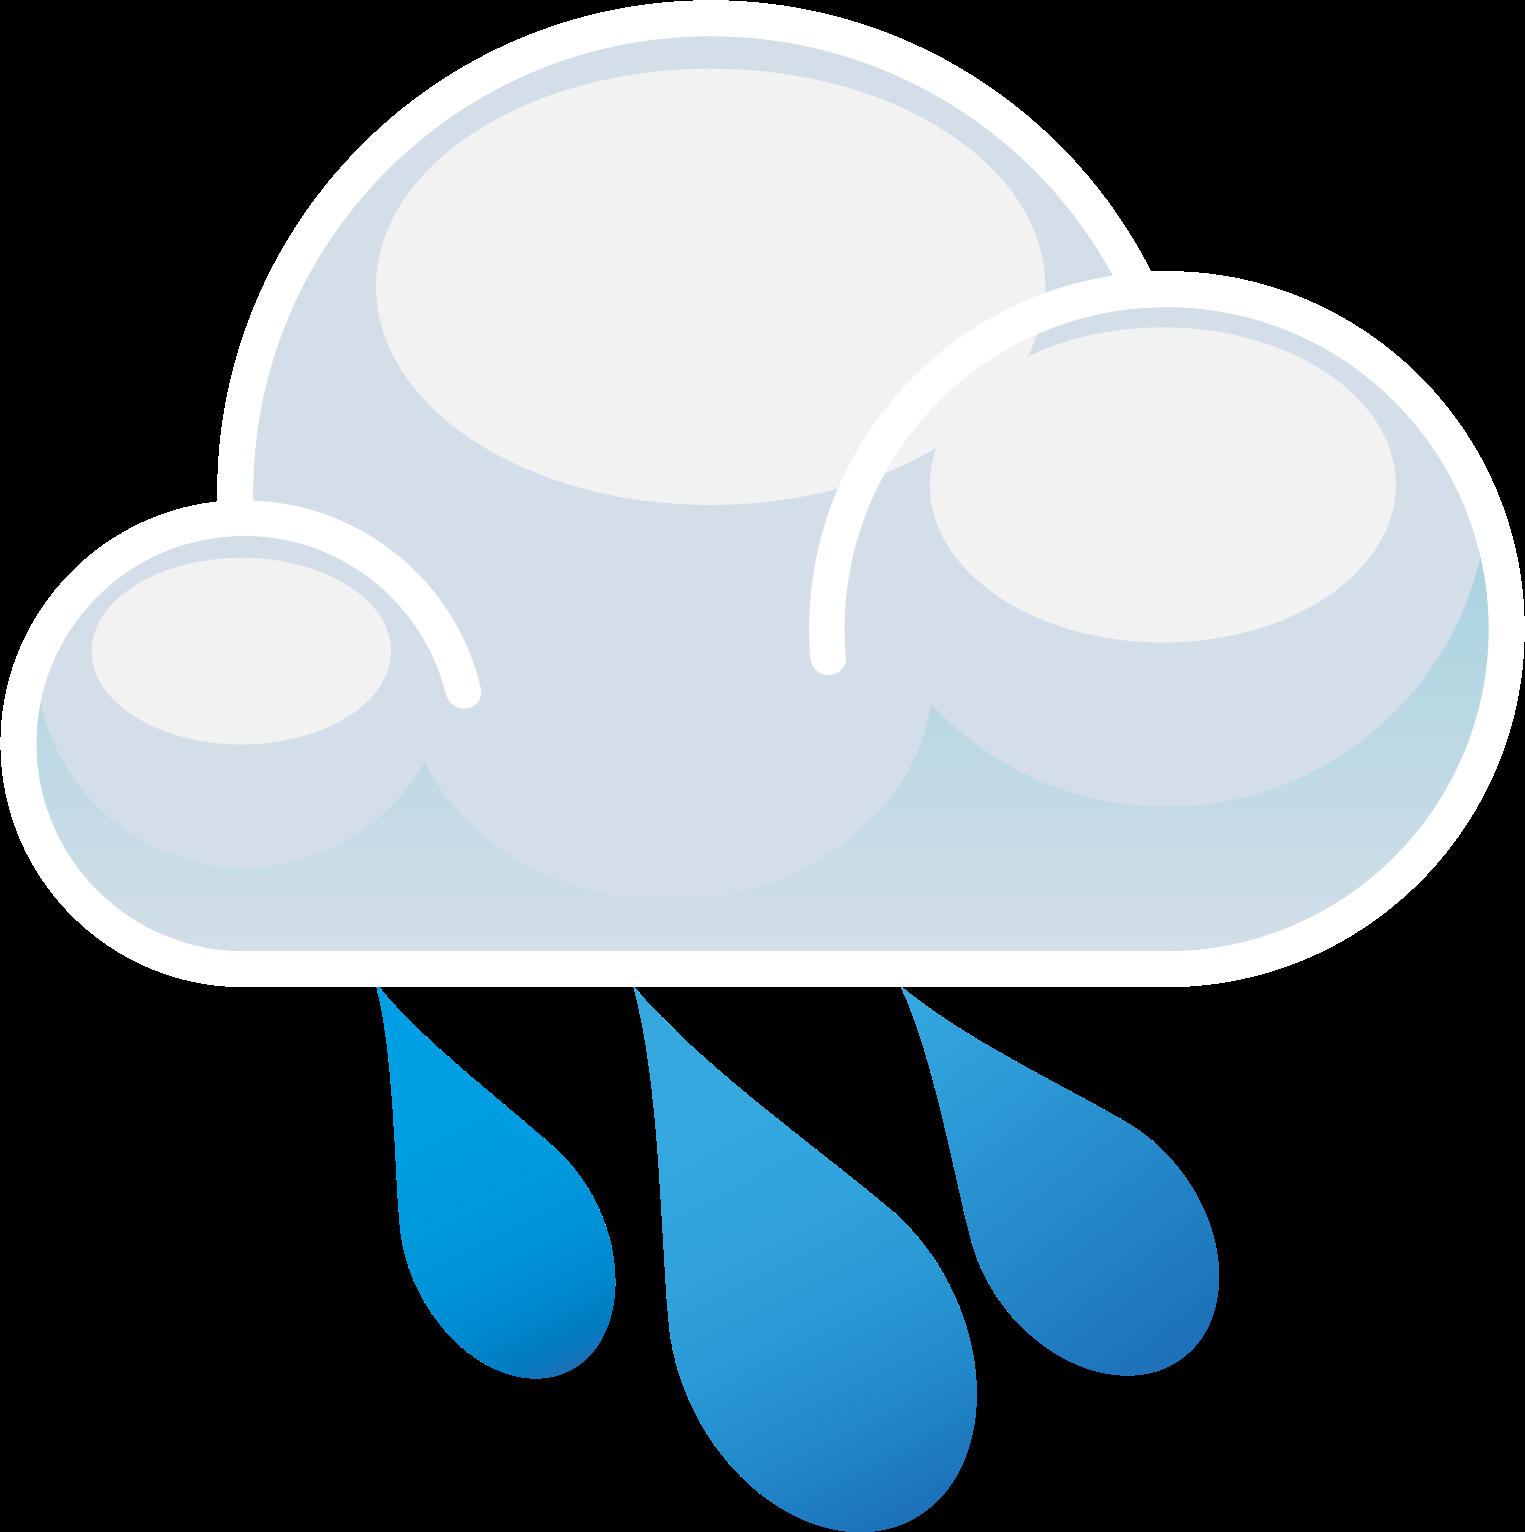 Cloud clipart vector. Rain showers free download